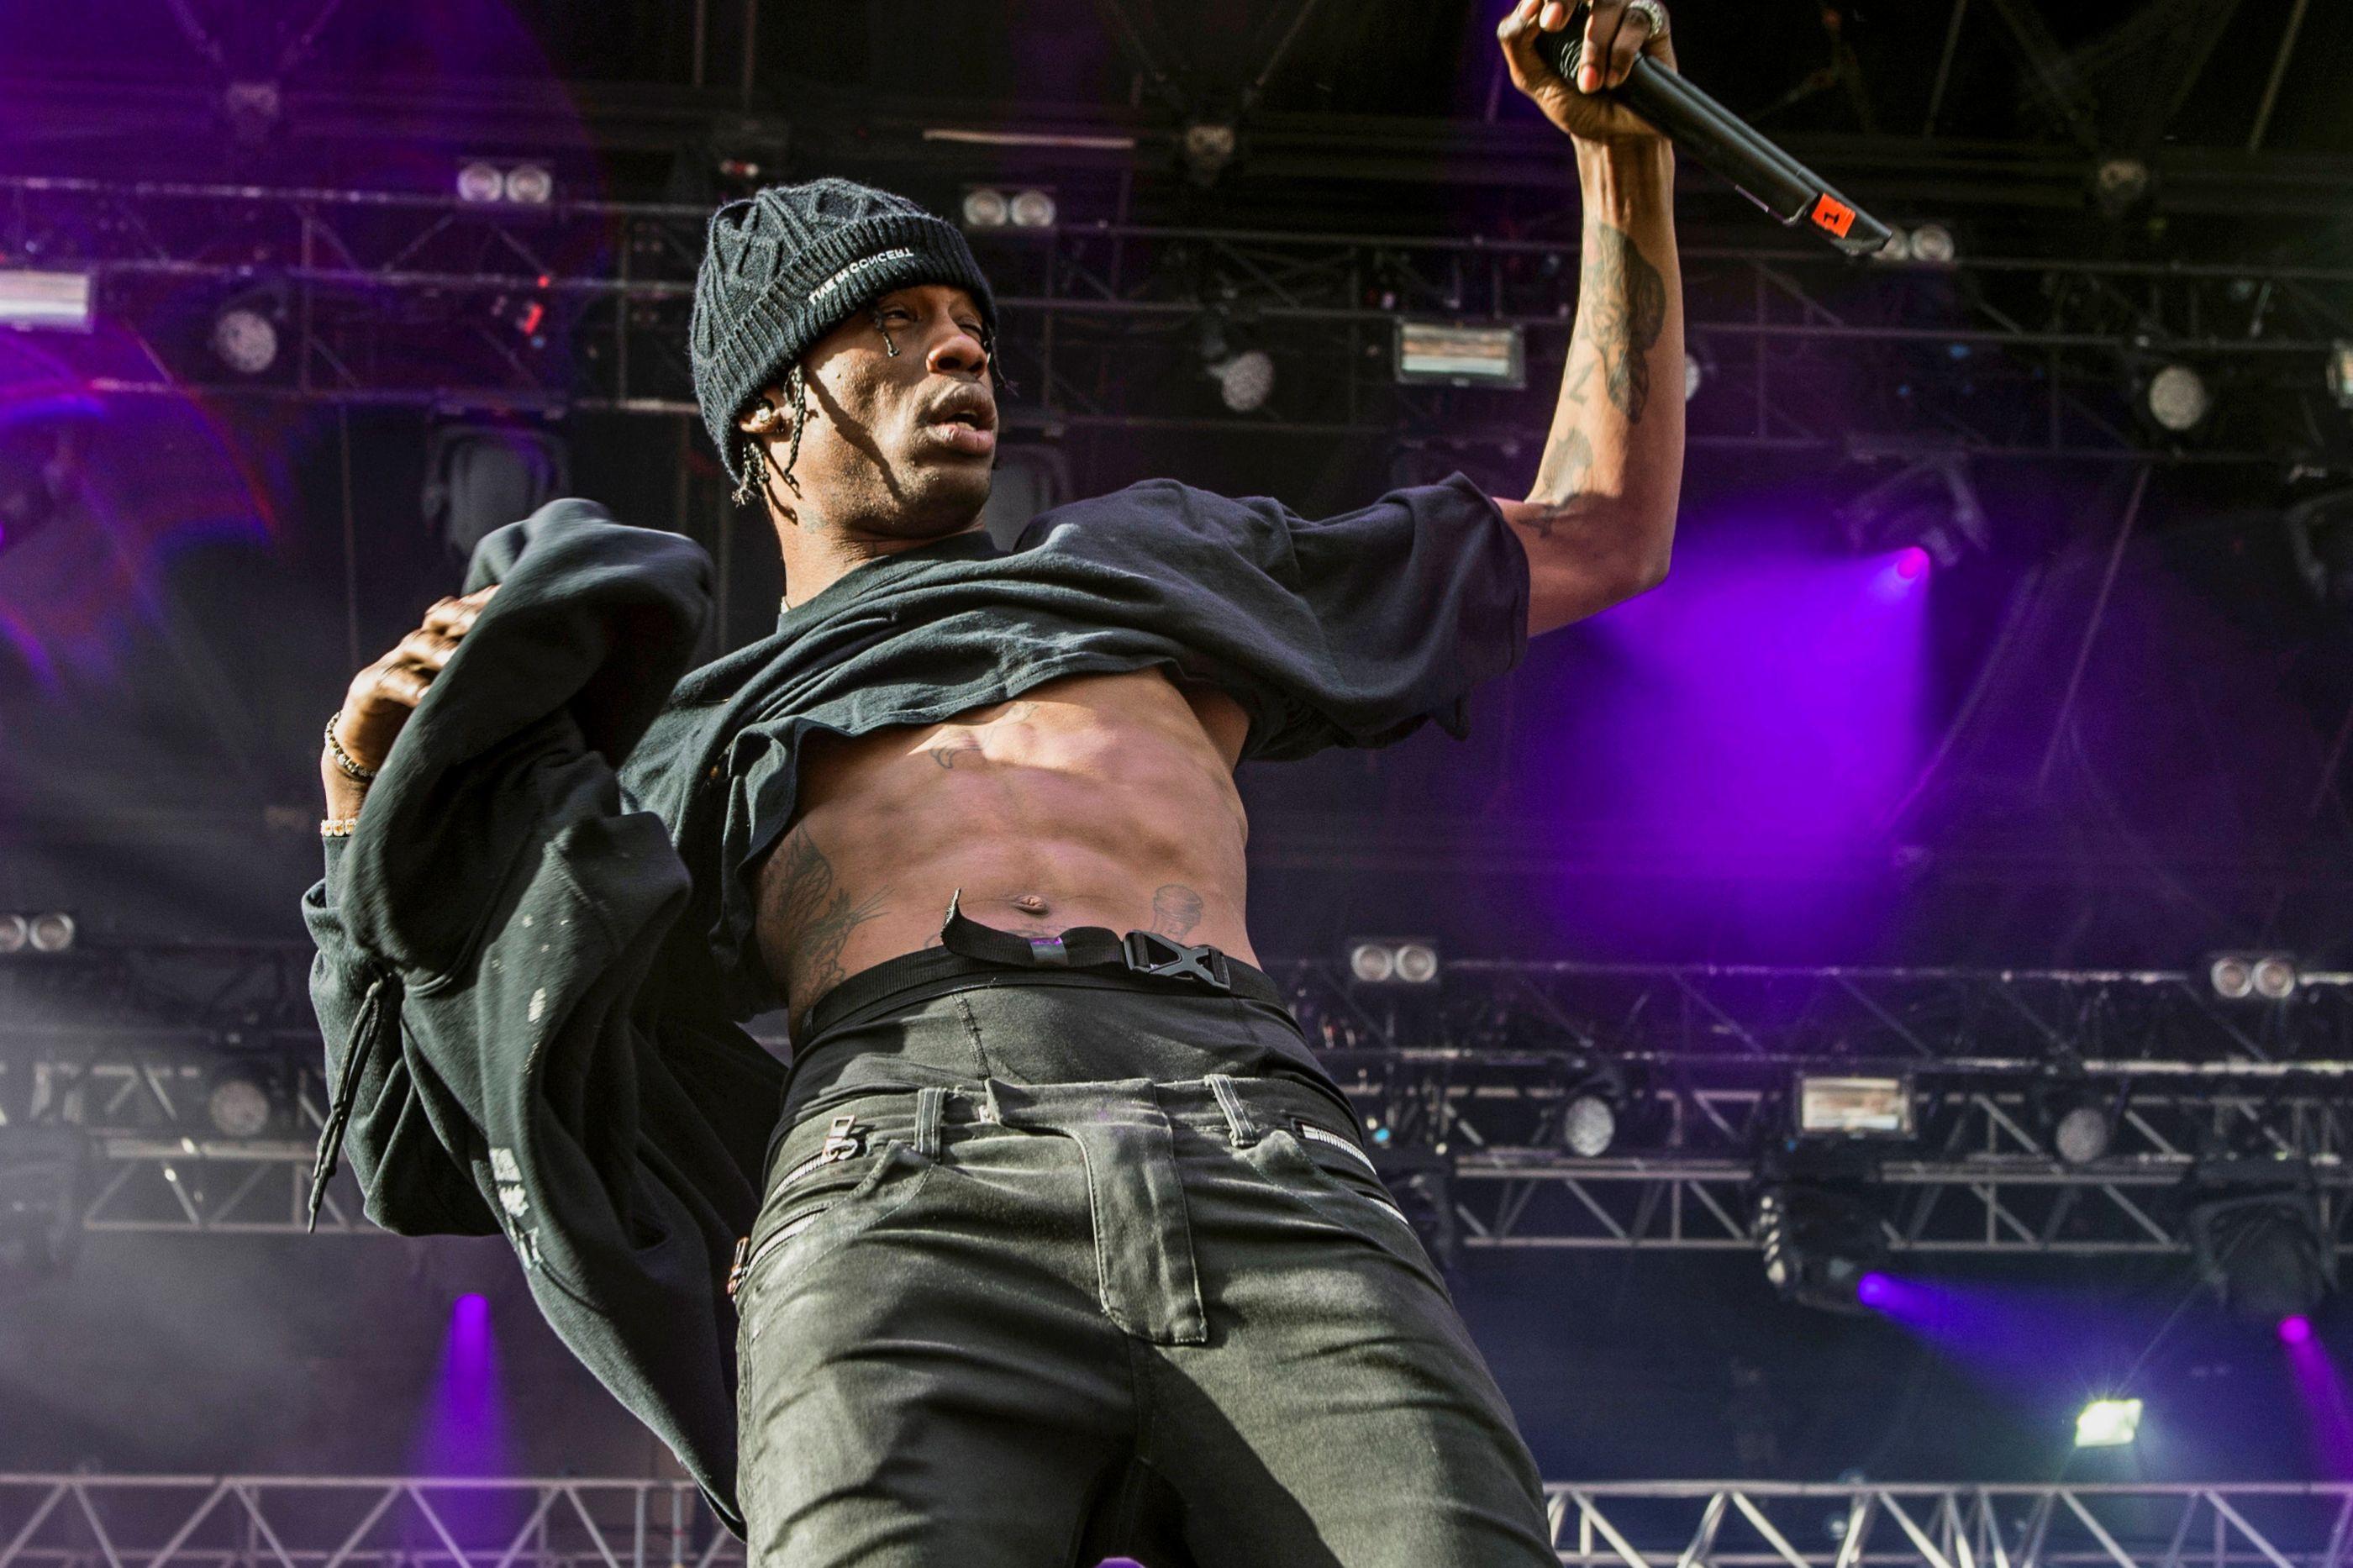 DJ acusa Travis Scott de plágio. Artista pede 20 milhões de dólares